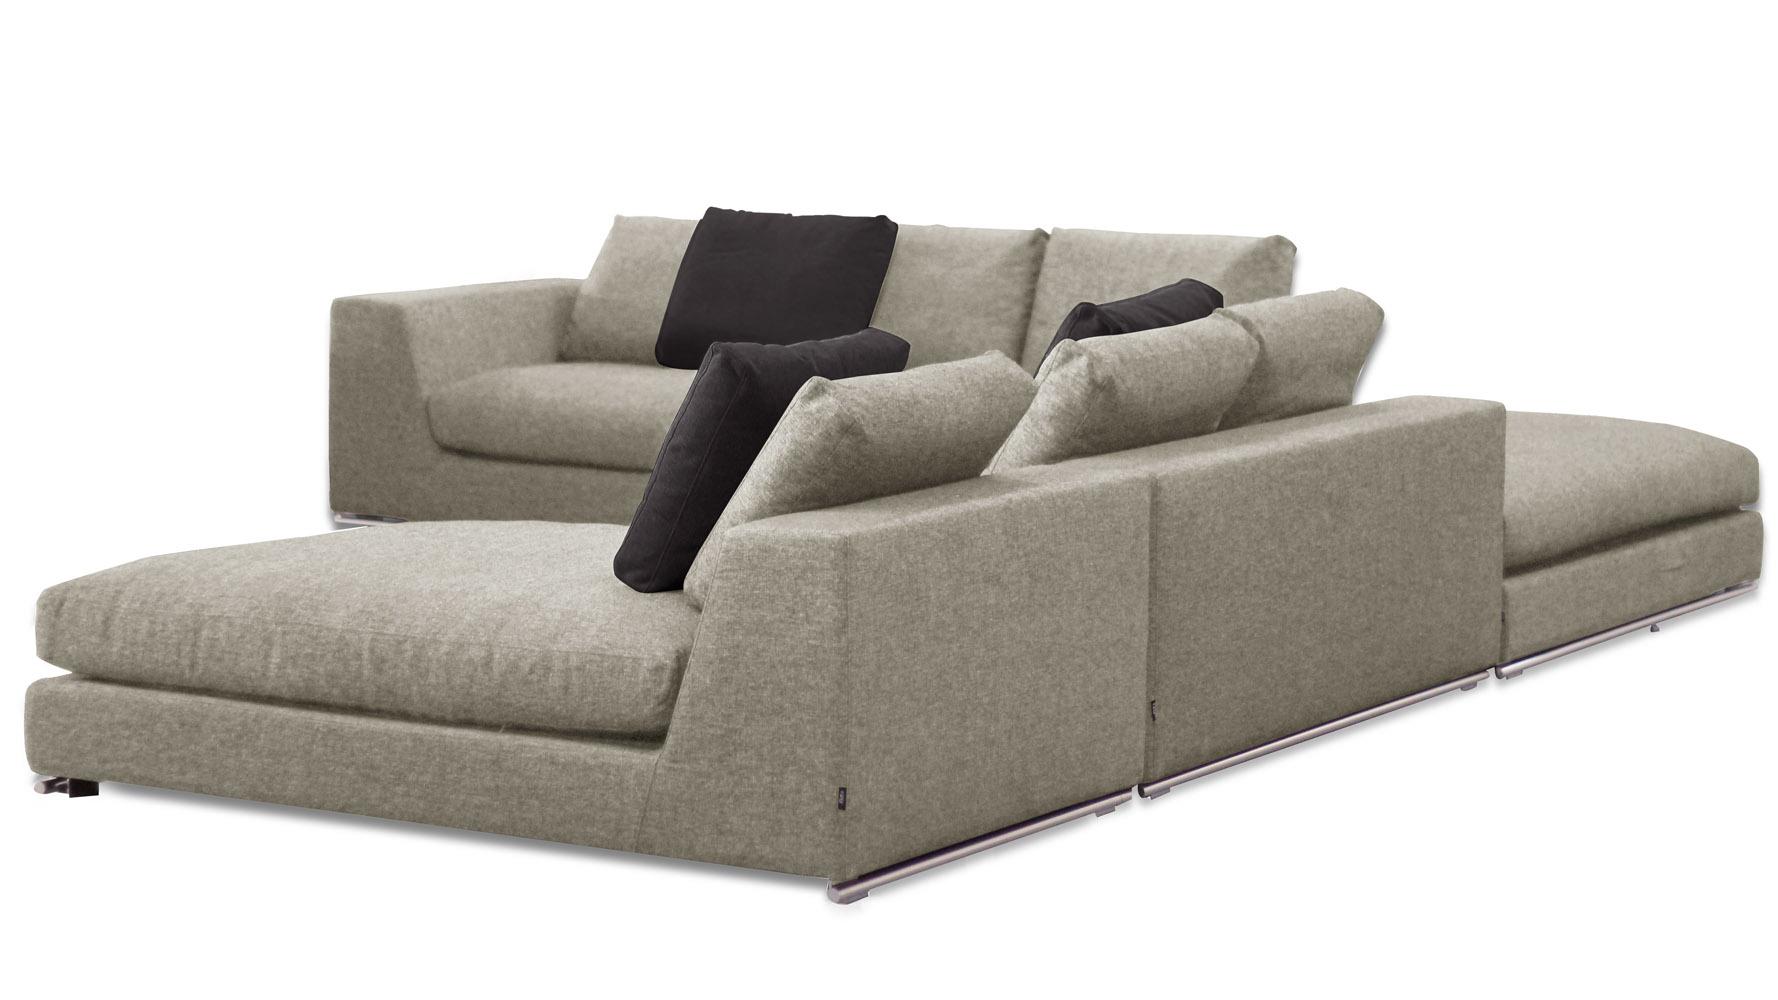 Comodo Sectional Sofa With Ottoman Grey Zuri Furniture ~ Sofa With Chaise Ottoman